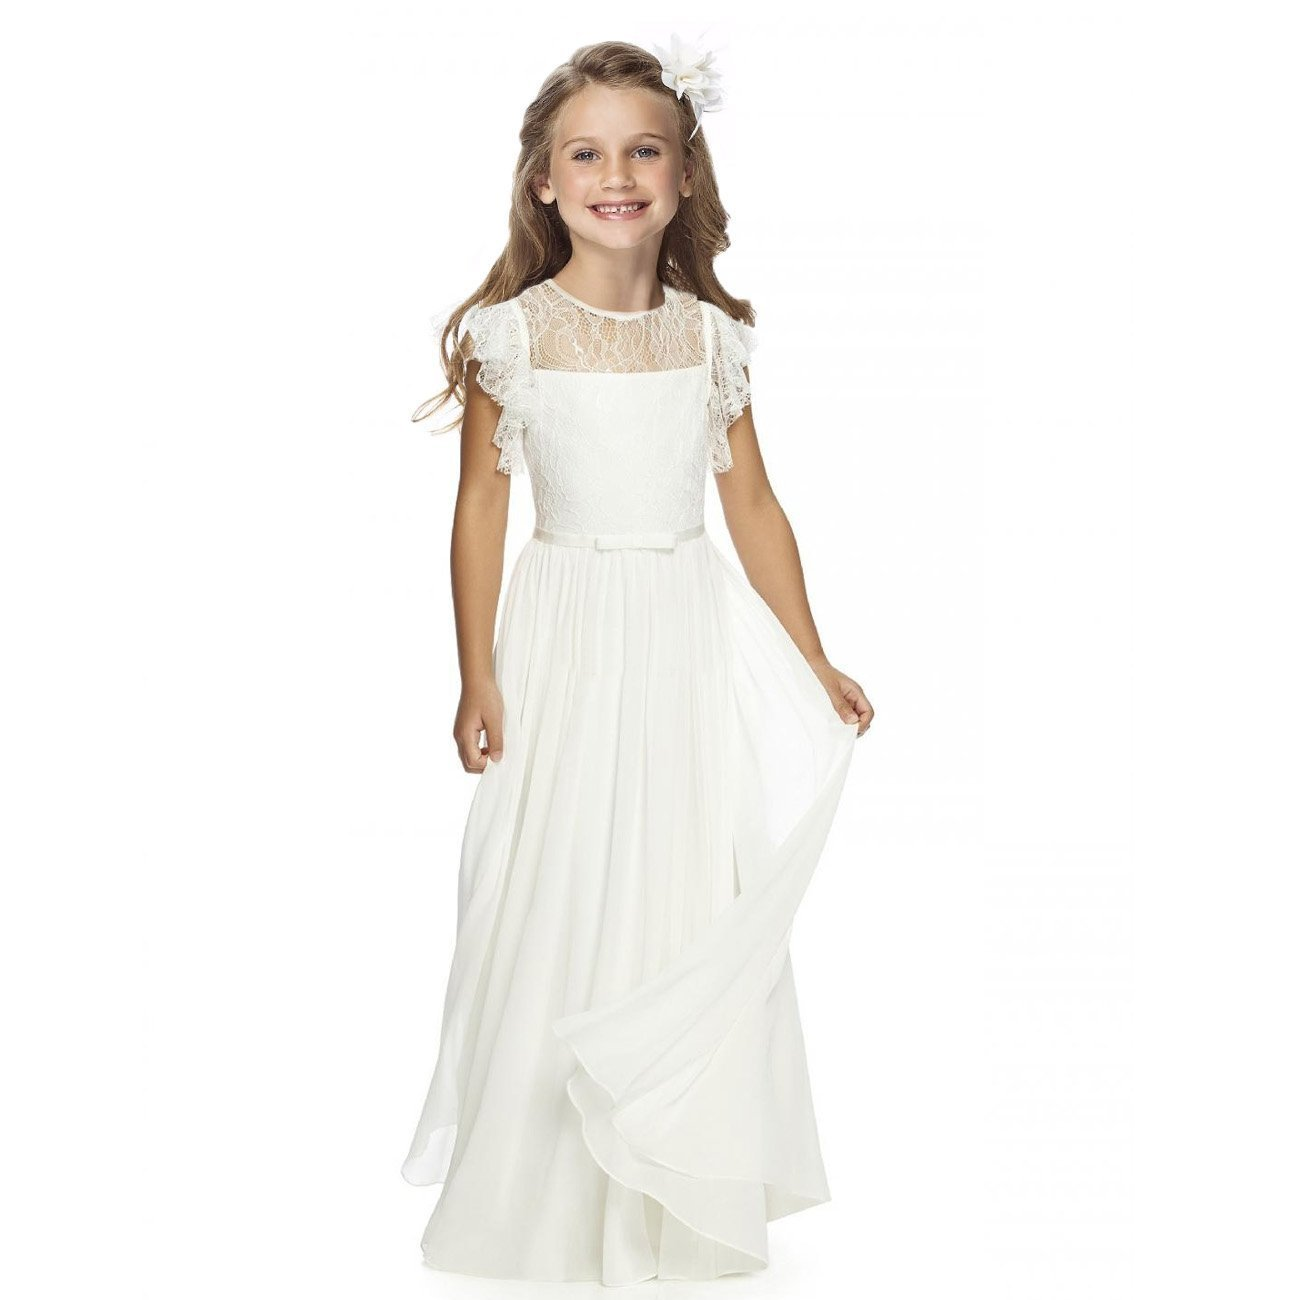 Amazon Sittingley Fancy Girls Holy Communion Dresses 1 12 Year